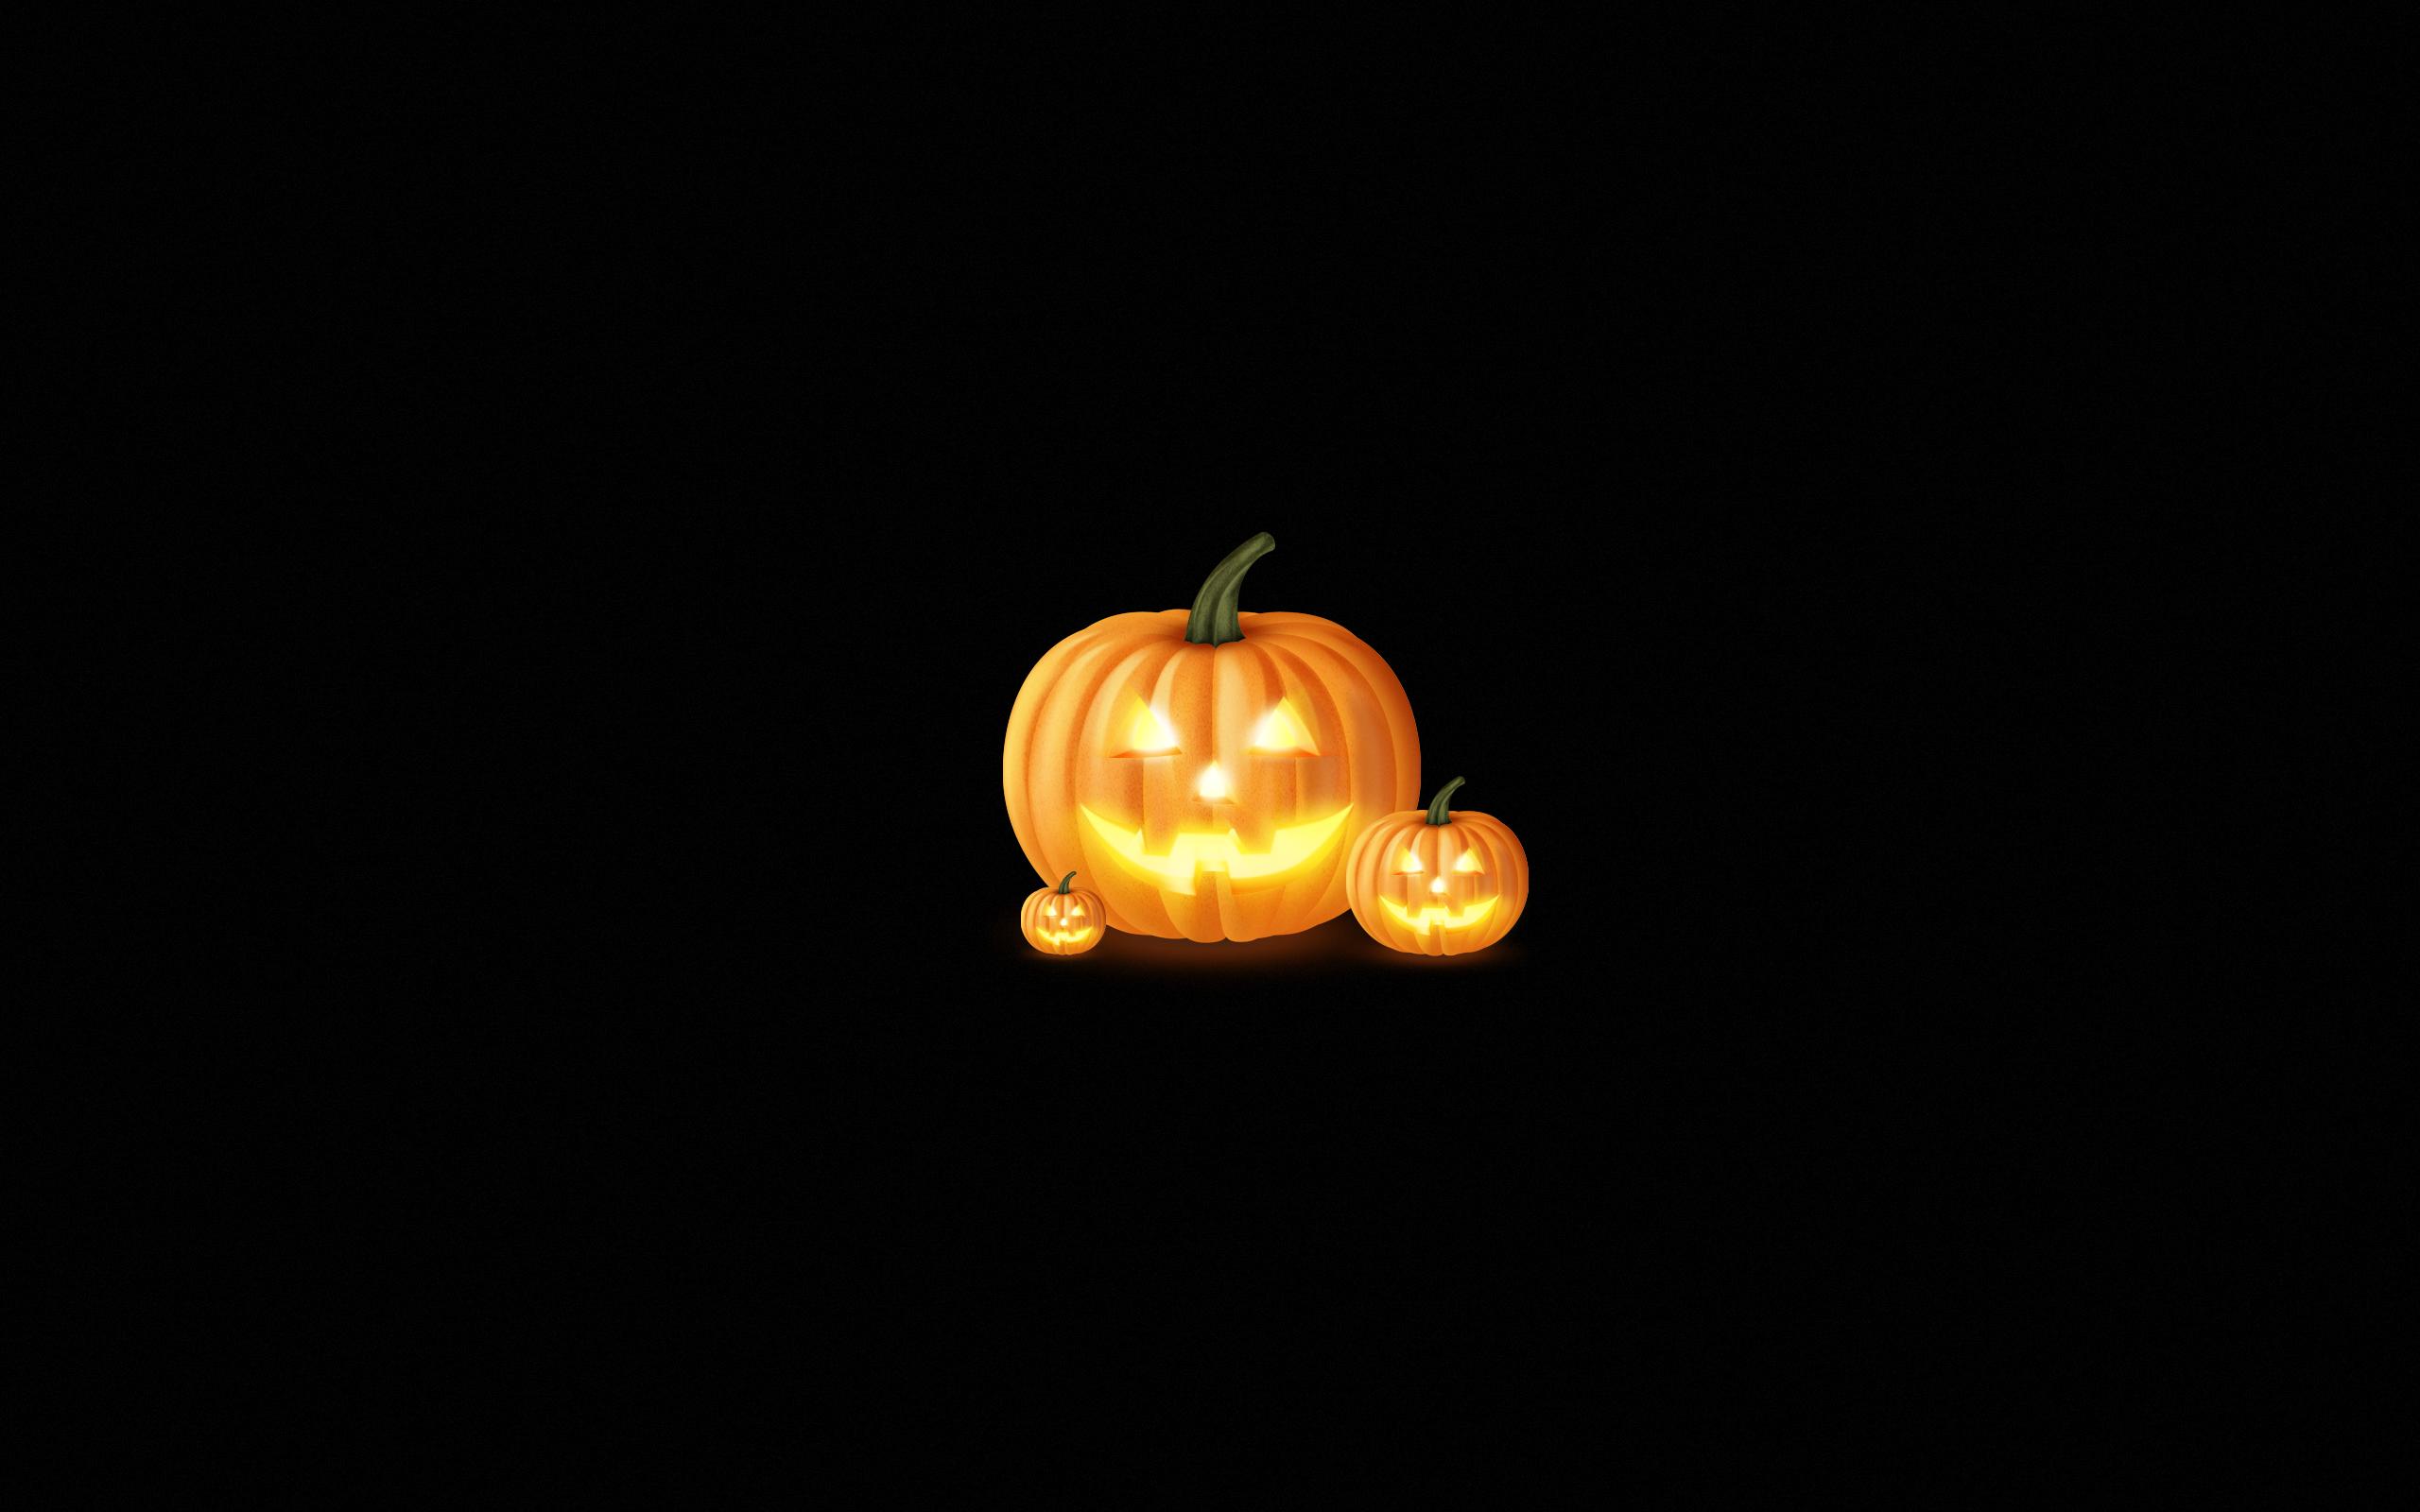 General 2560x1600 Halloween spooky minimalism glowing eyes pumpkin